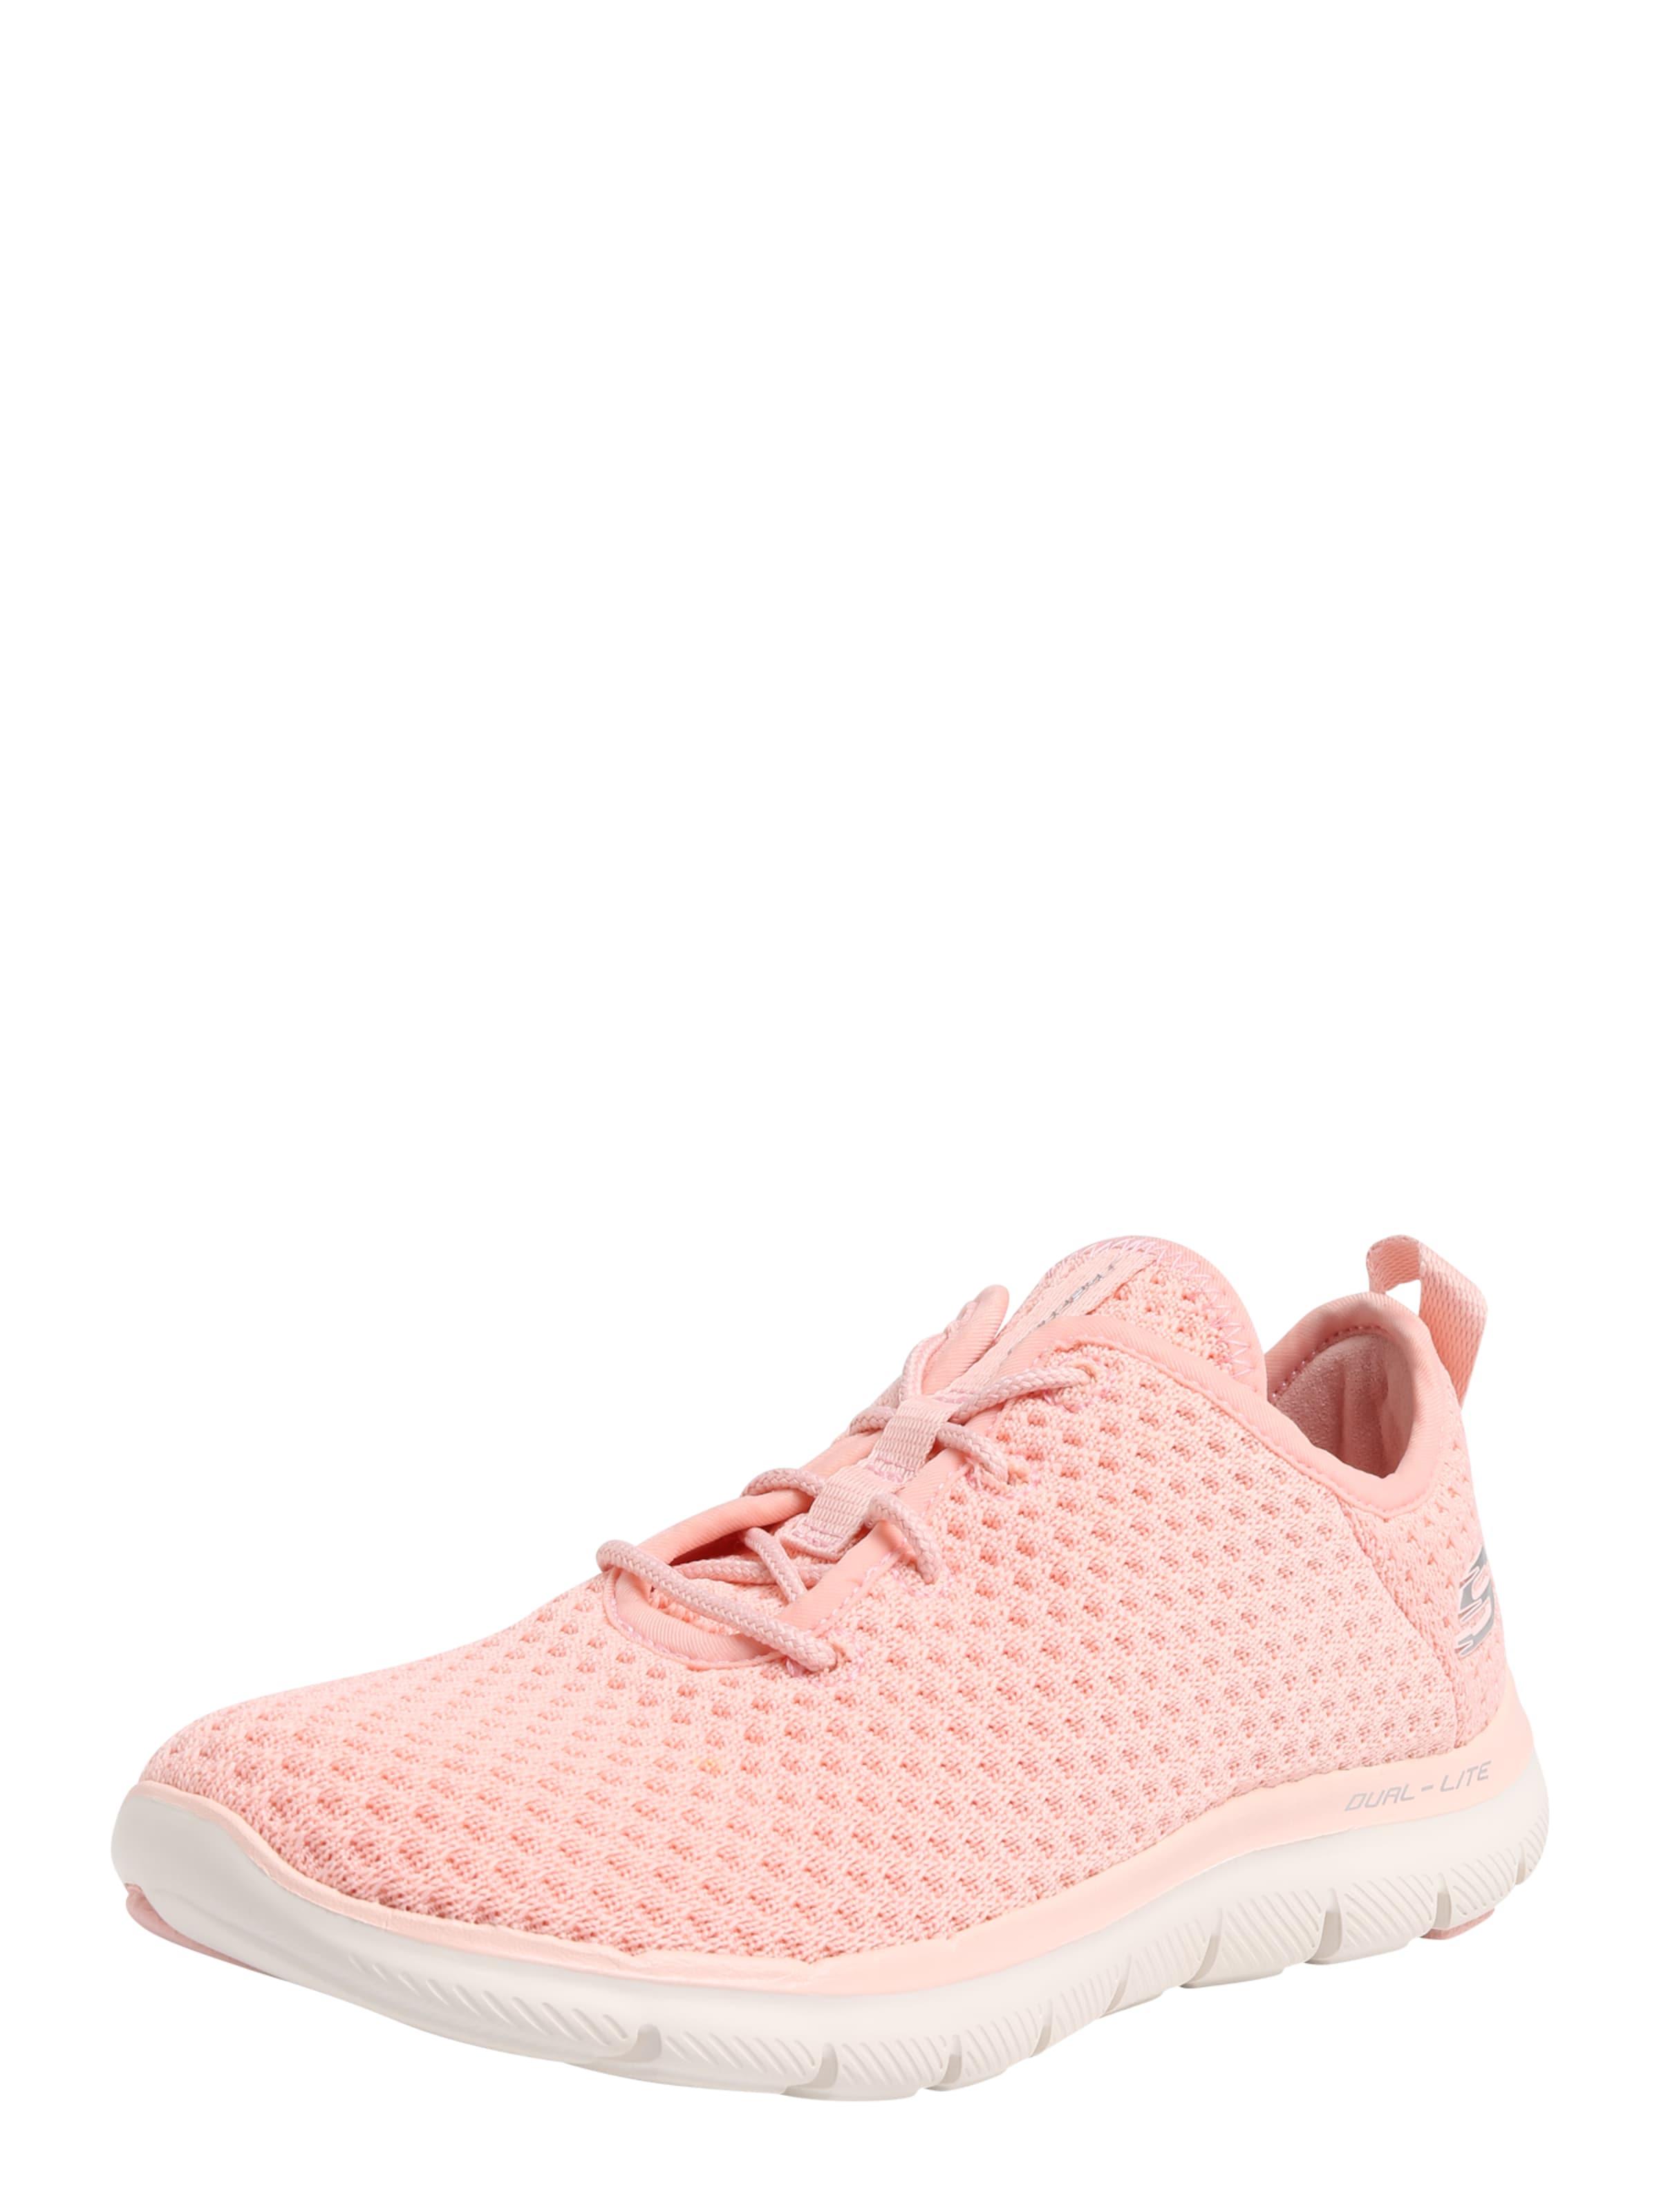 Skechers Sneaker Low 'Flex Appeal 2.0 - Bold Move' Rosa Empfehlen Günstig Online Modestil Amazon Footaction SMM0Ow8P